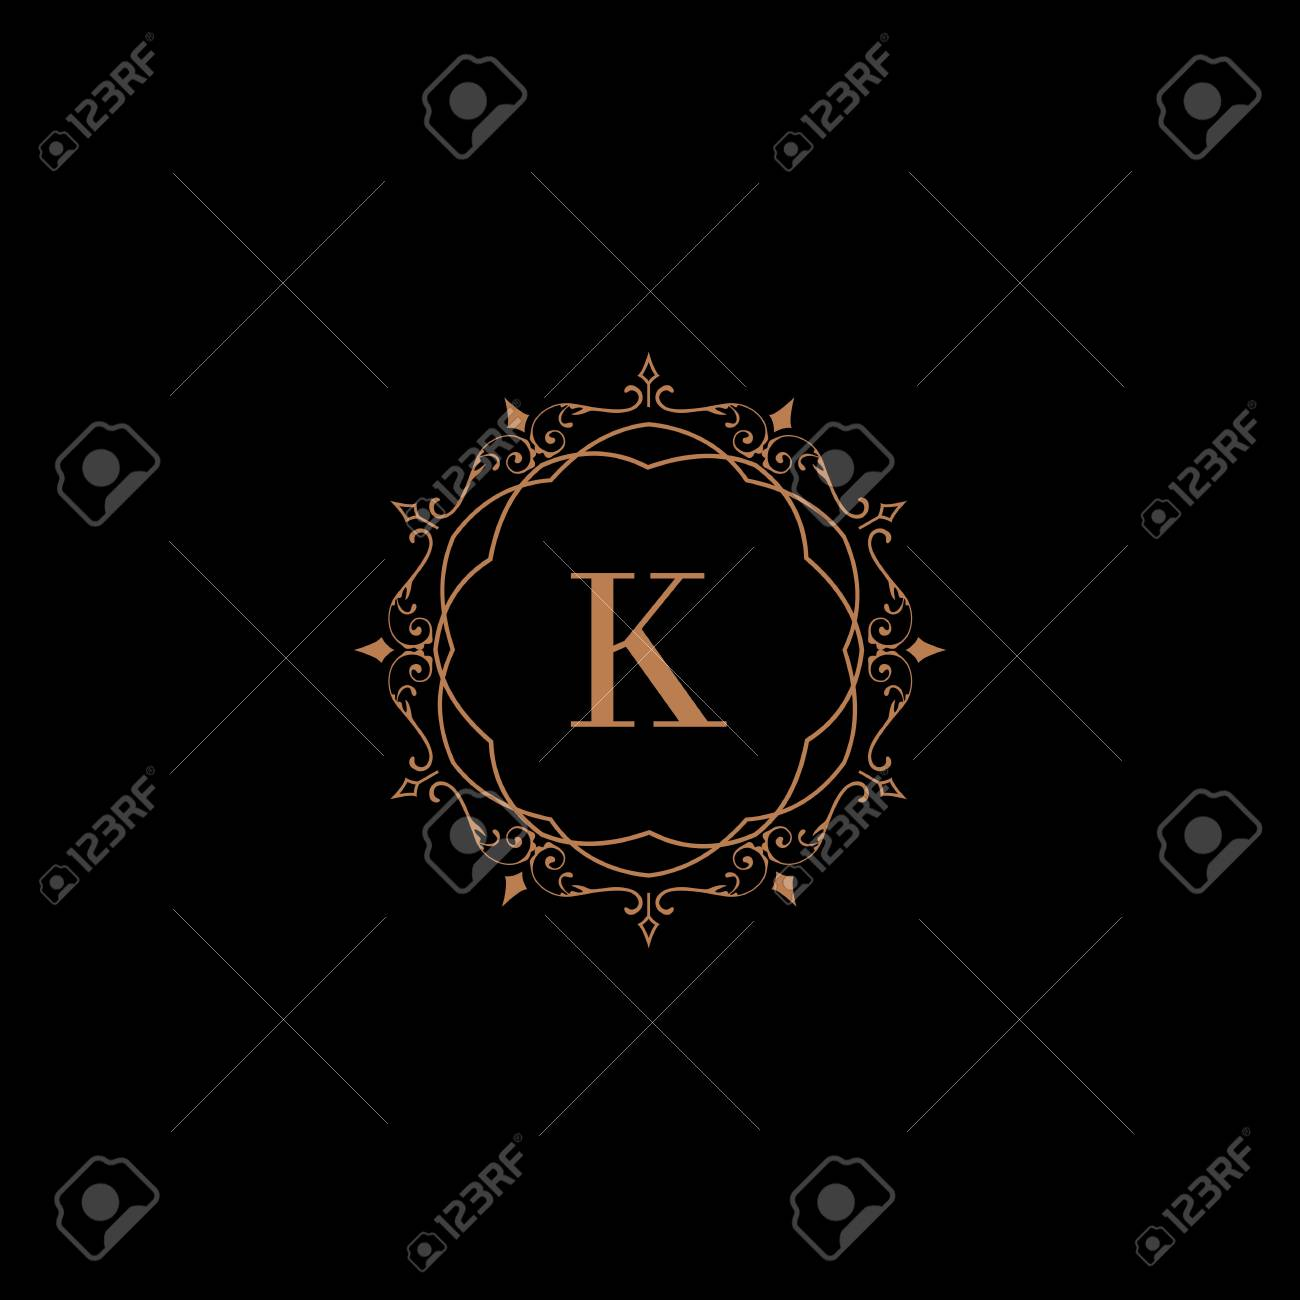 luxury brand real estate crest logo crests crown royal fashion